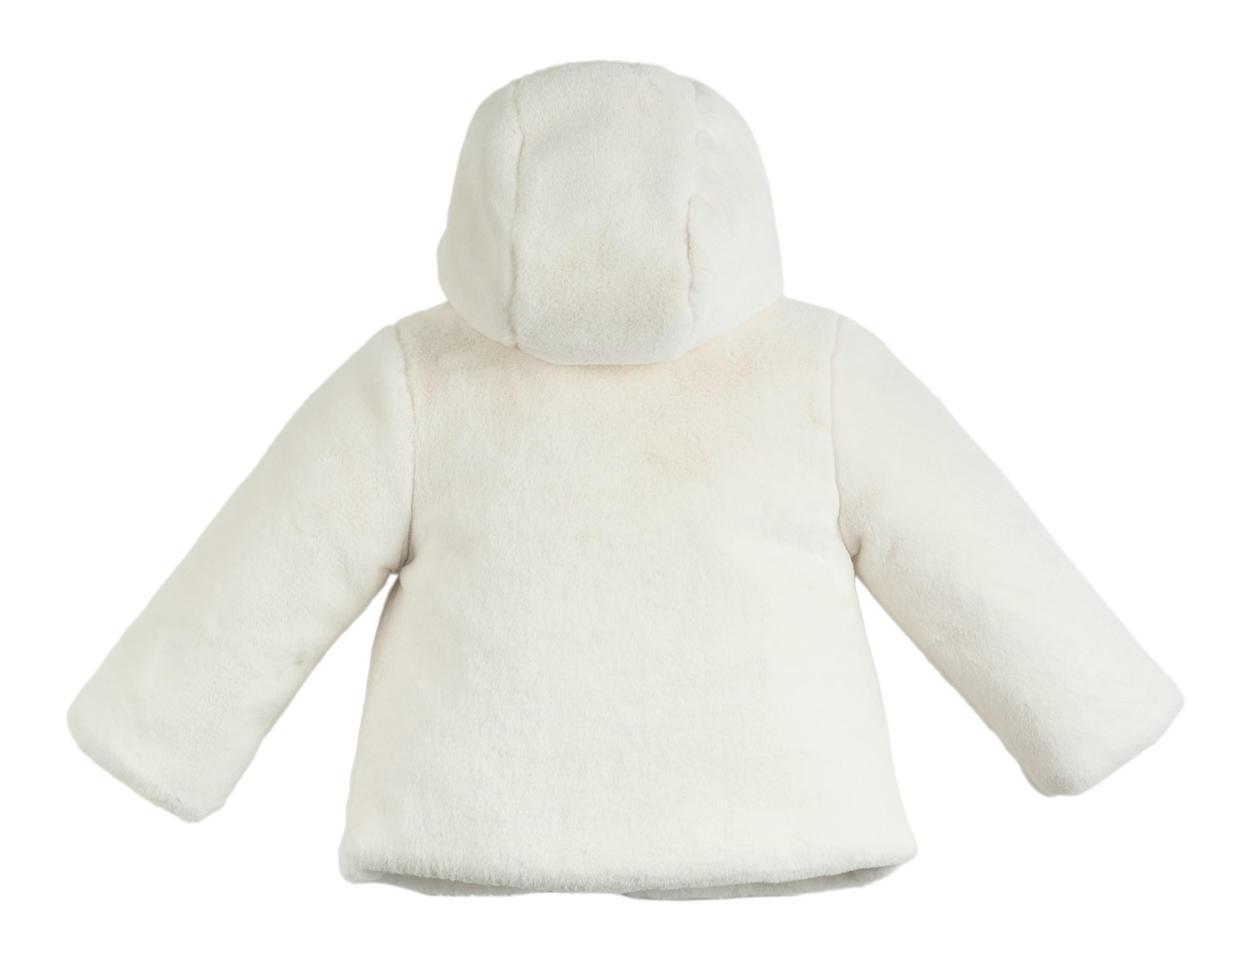 online store 10813 733b9 Morbido pellicciotto ecologico foderato per bambina da 6 a 36 mesi iDO